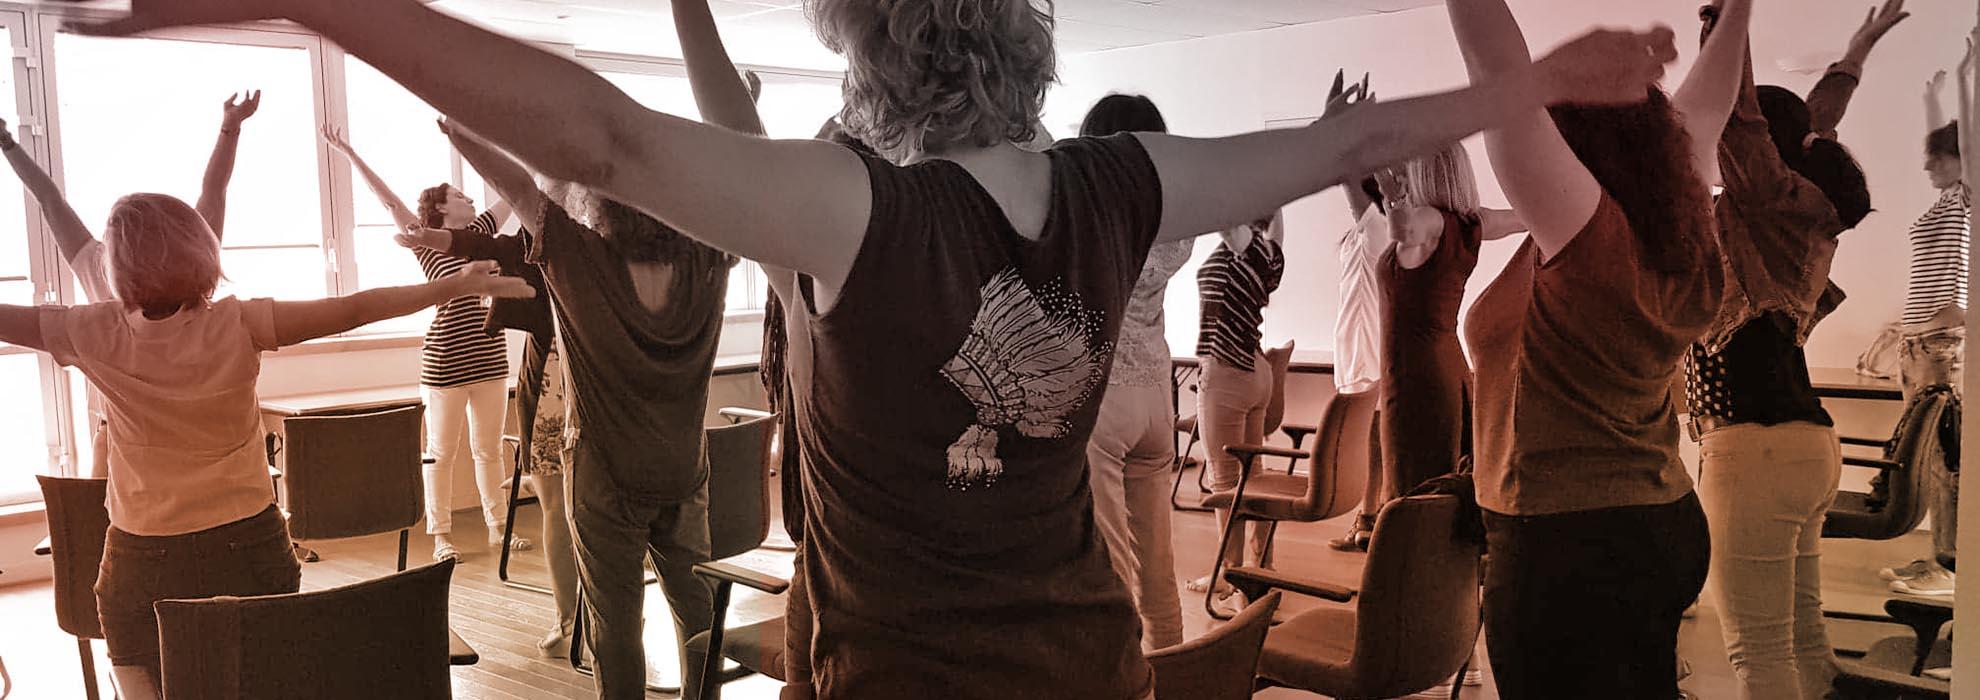 Atelier massage-sophrologie-meditation-lyon-cecile-boby-aliptae